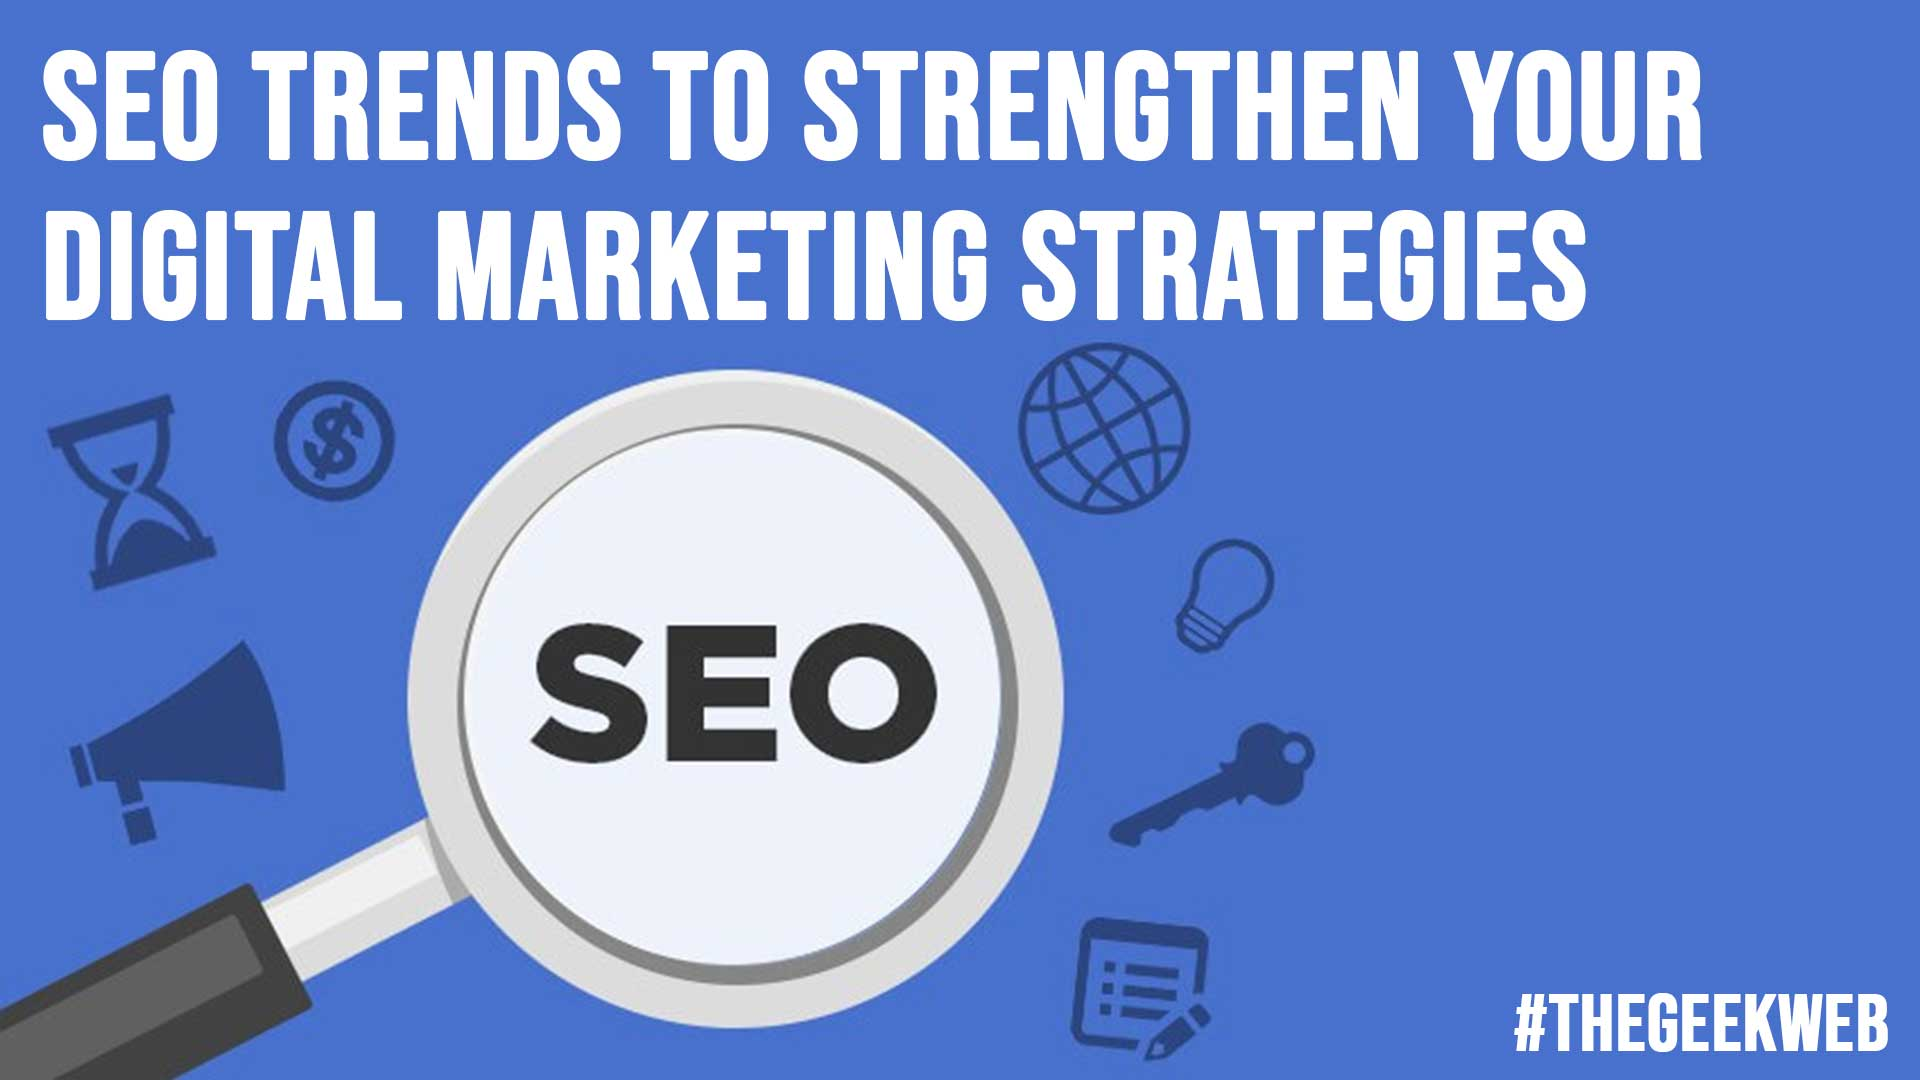 SEO Trends to Strengthen Your Digital Marketing Strategies